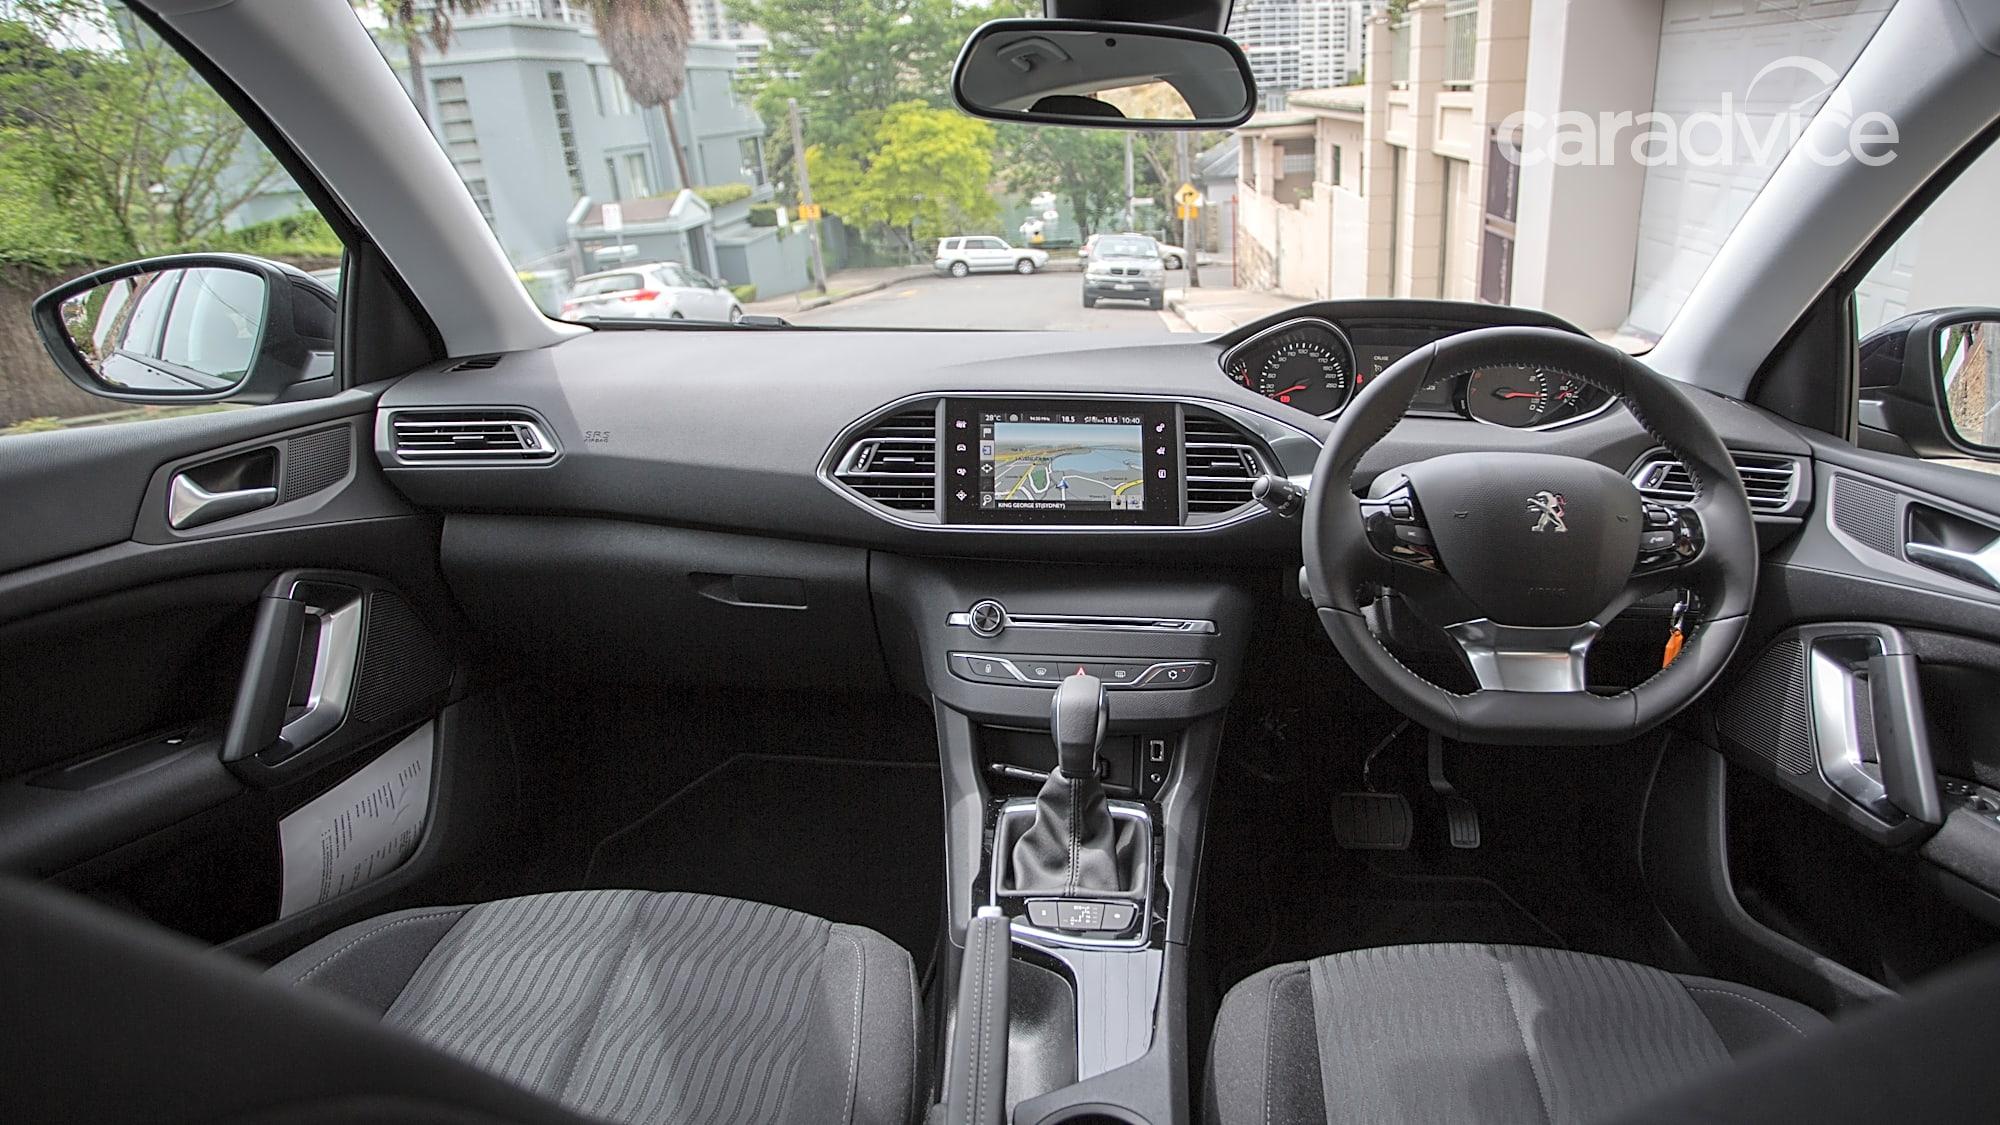 2017 Peugeot 308 Active review: Long-term report six – farewell | CarAdvice